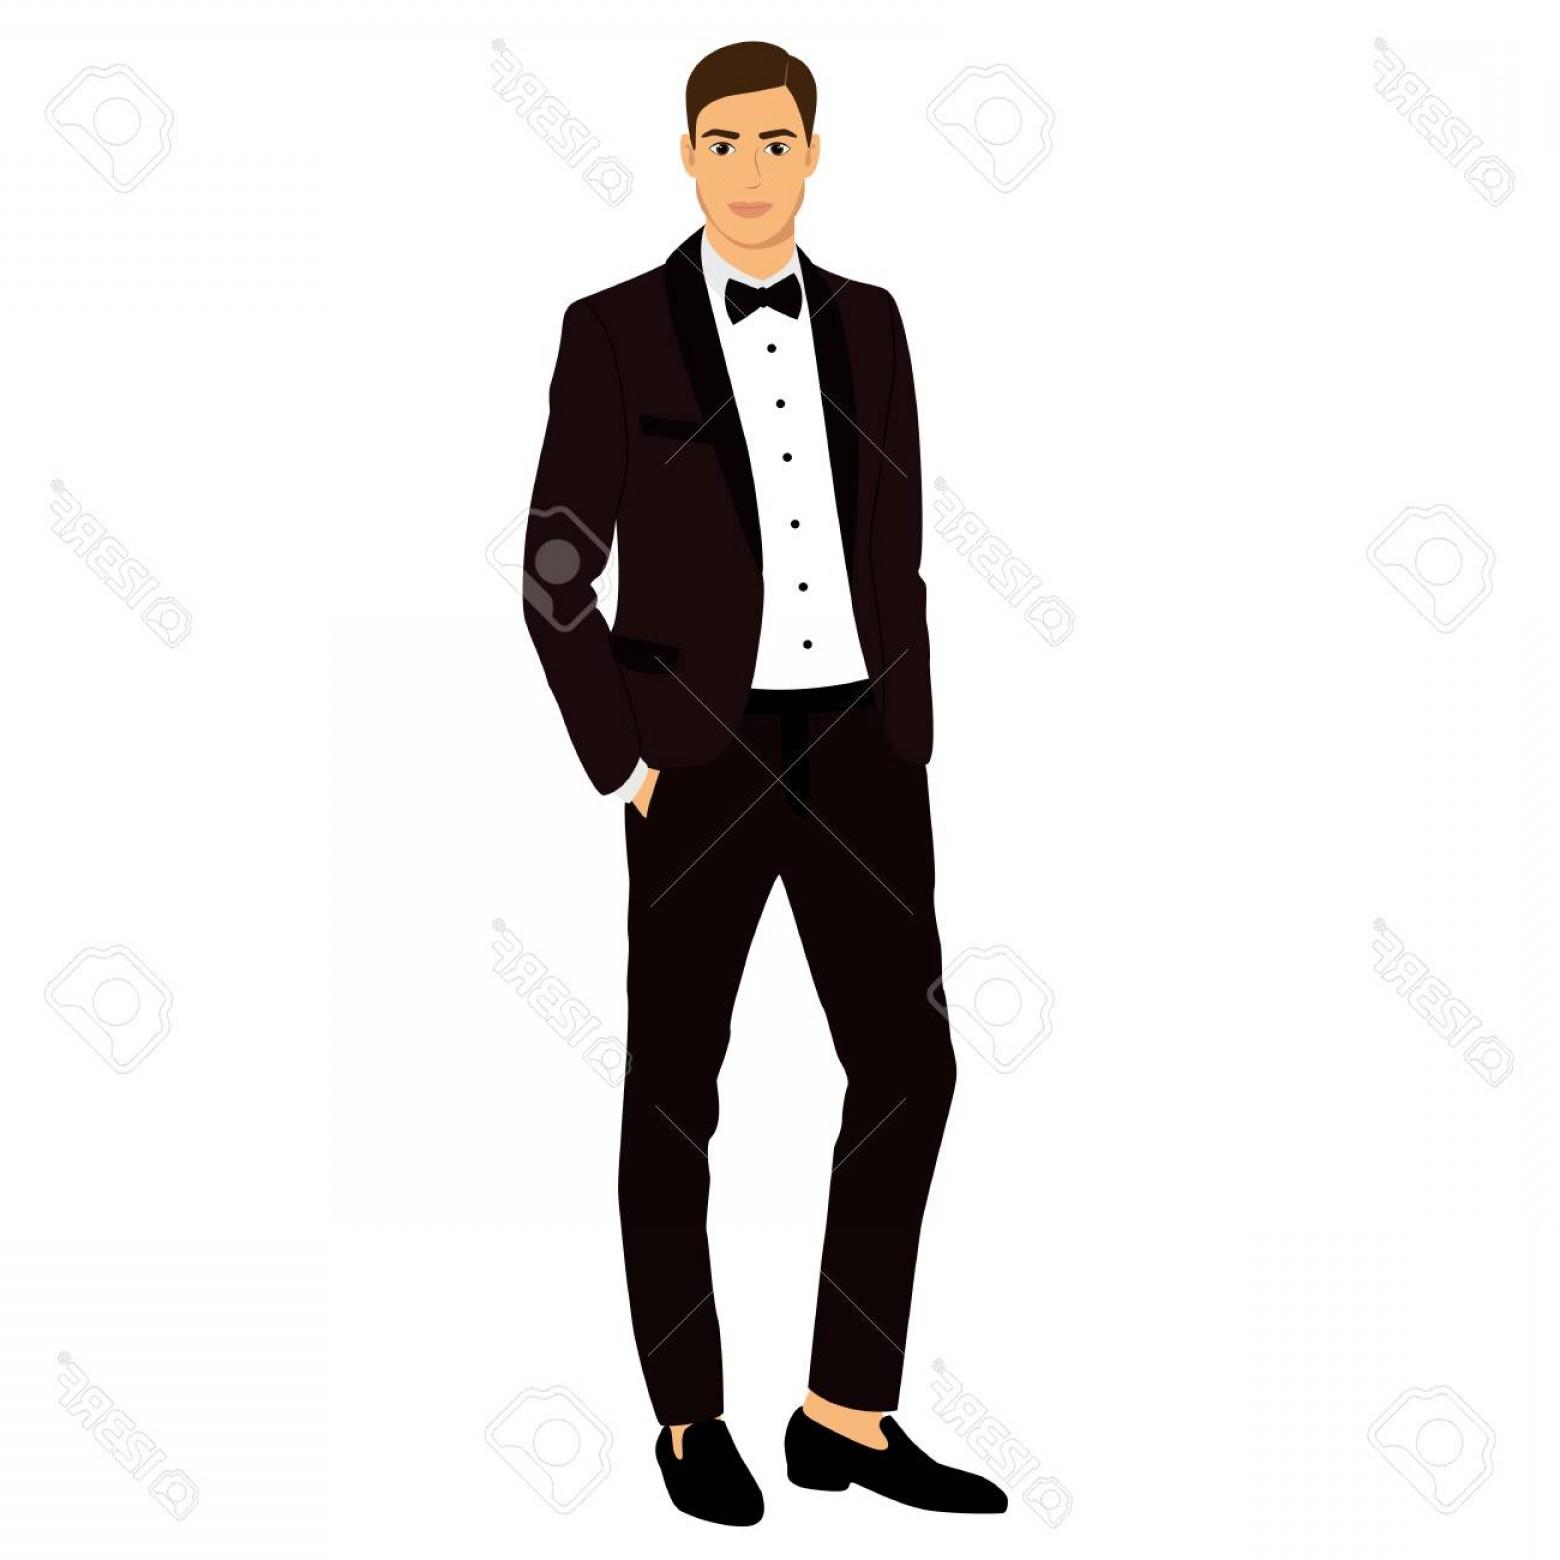 1560x1560 Photostock Vector The Groom Clothing Wedding Men S Suit Tuxedo